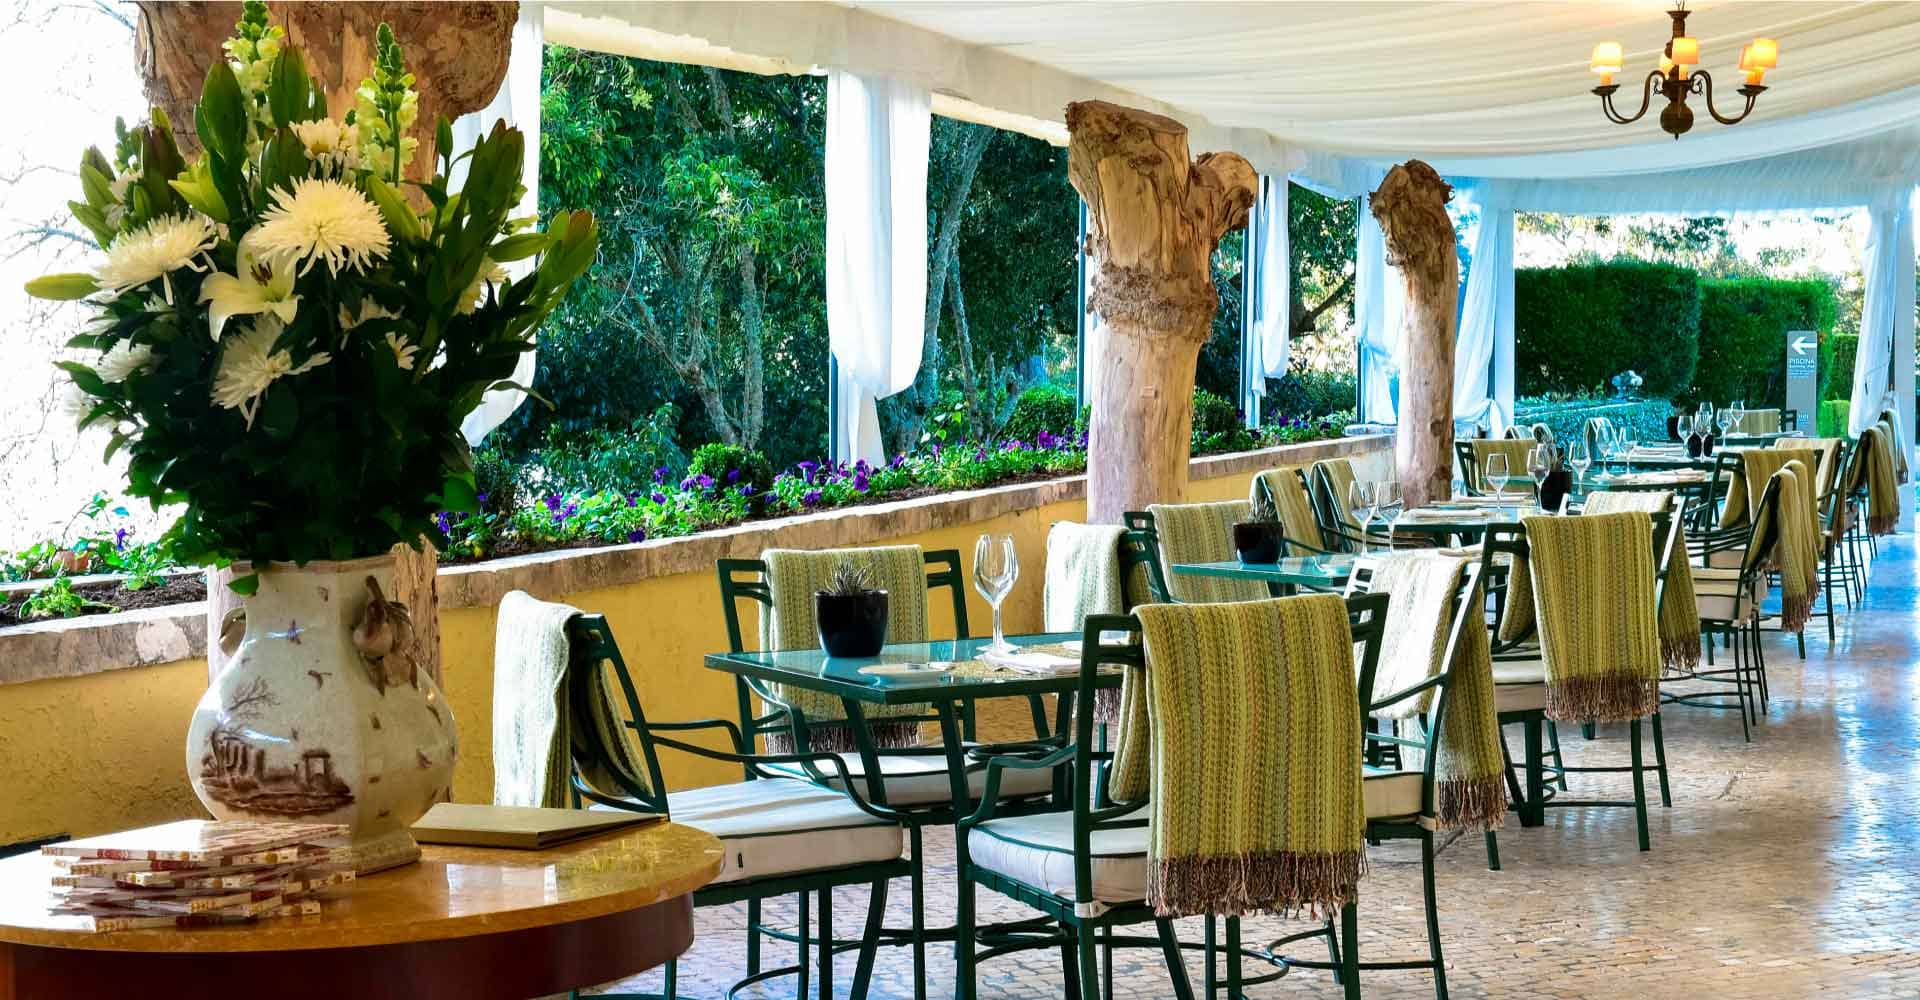 tivoli_palacio_seteais_restaurants_top_image1_1920x700.jpg